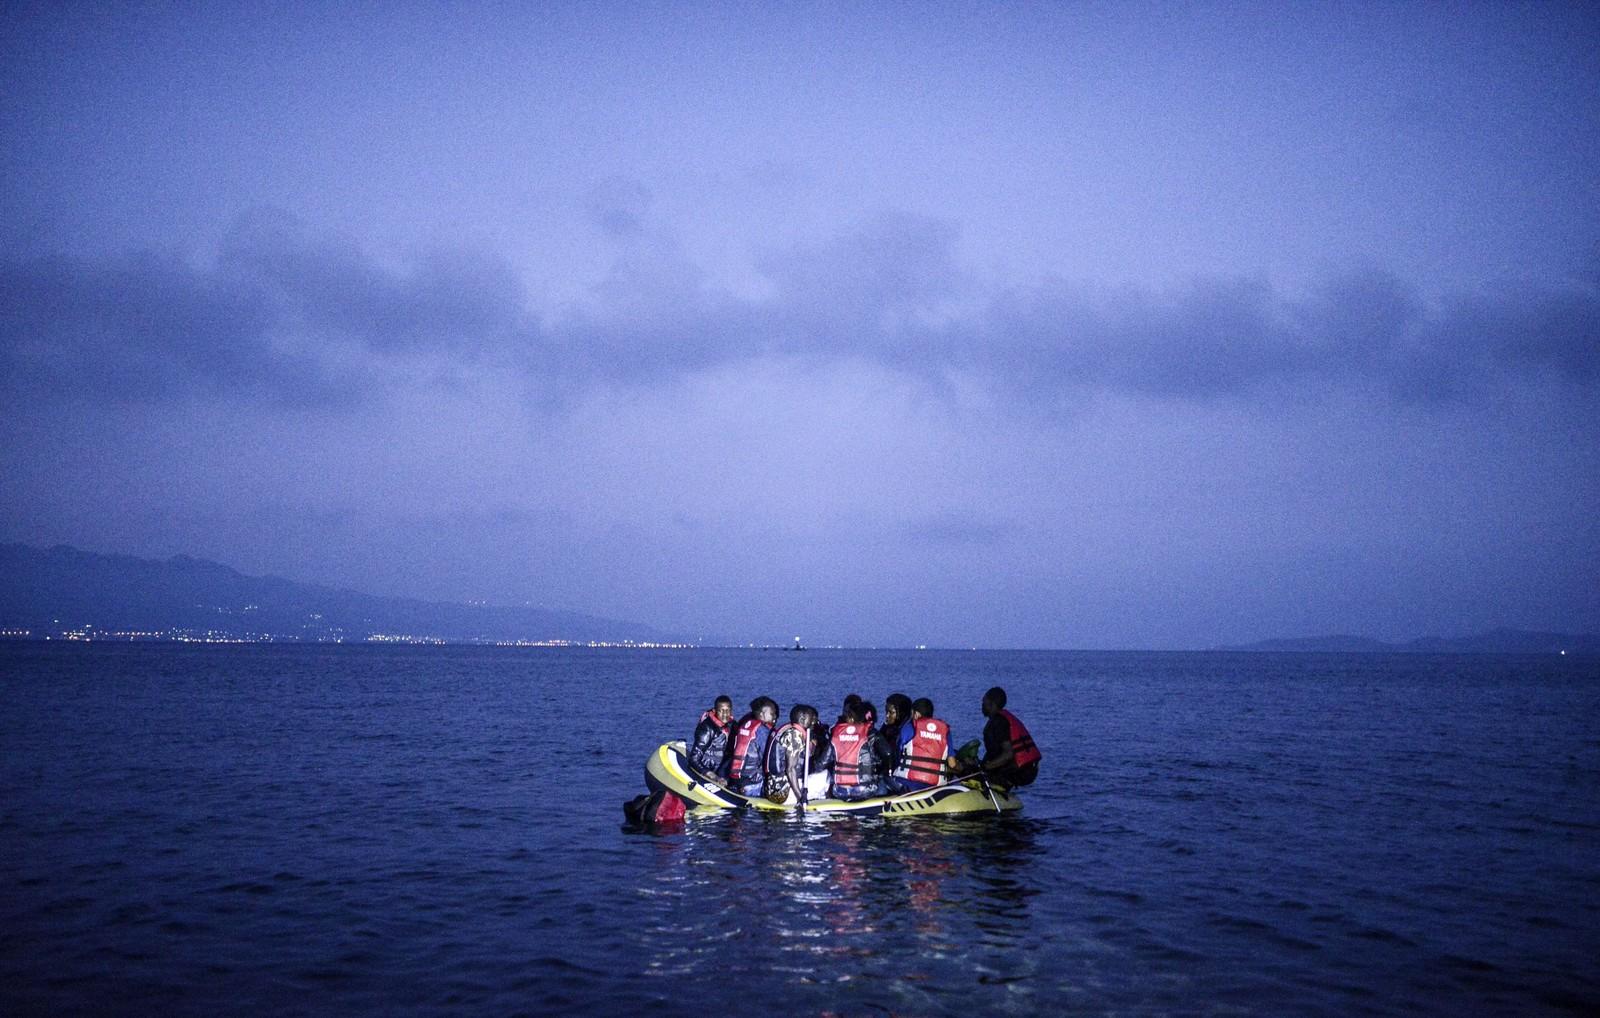 Dette er imidlertid ikke et kunstverk signert Banksy. Bildet viser flyktninger på vei til den greske øya Kos. Over 7.000 flyktninger skal være ankommet den greske øya med 30.000 fastboende.